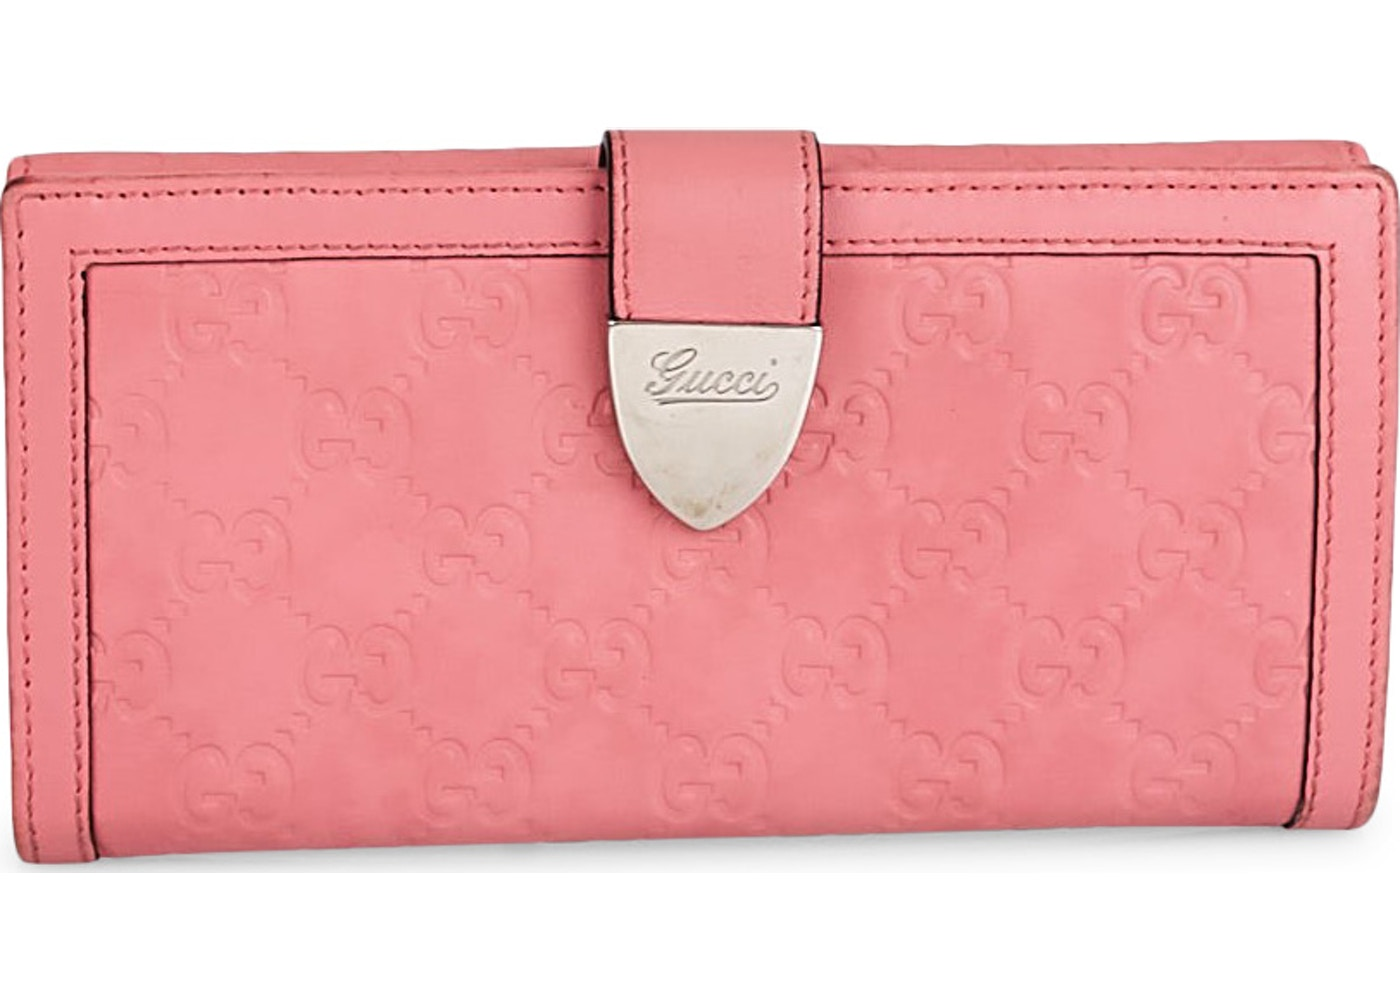 aa5d9c73220 View All Bids. Gucci Long Flap Wallet Monogram Guccissima Pink. Monogram  Guccissima Pink